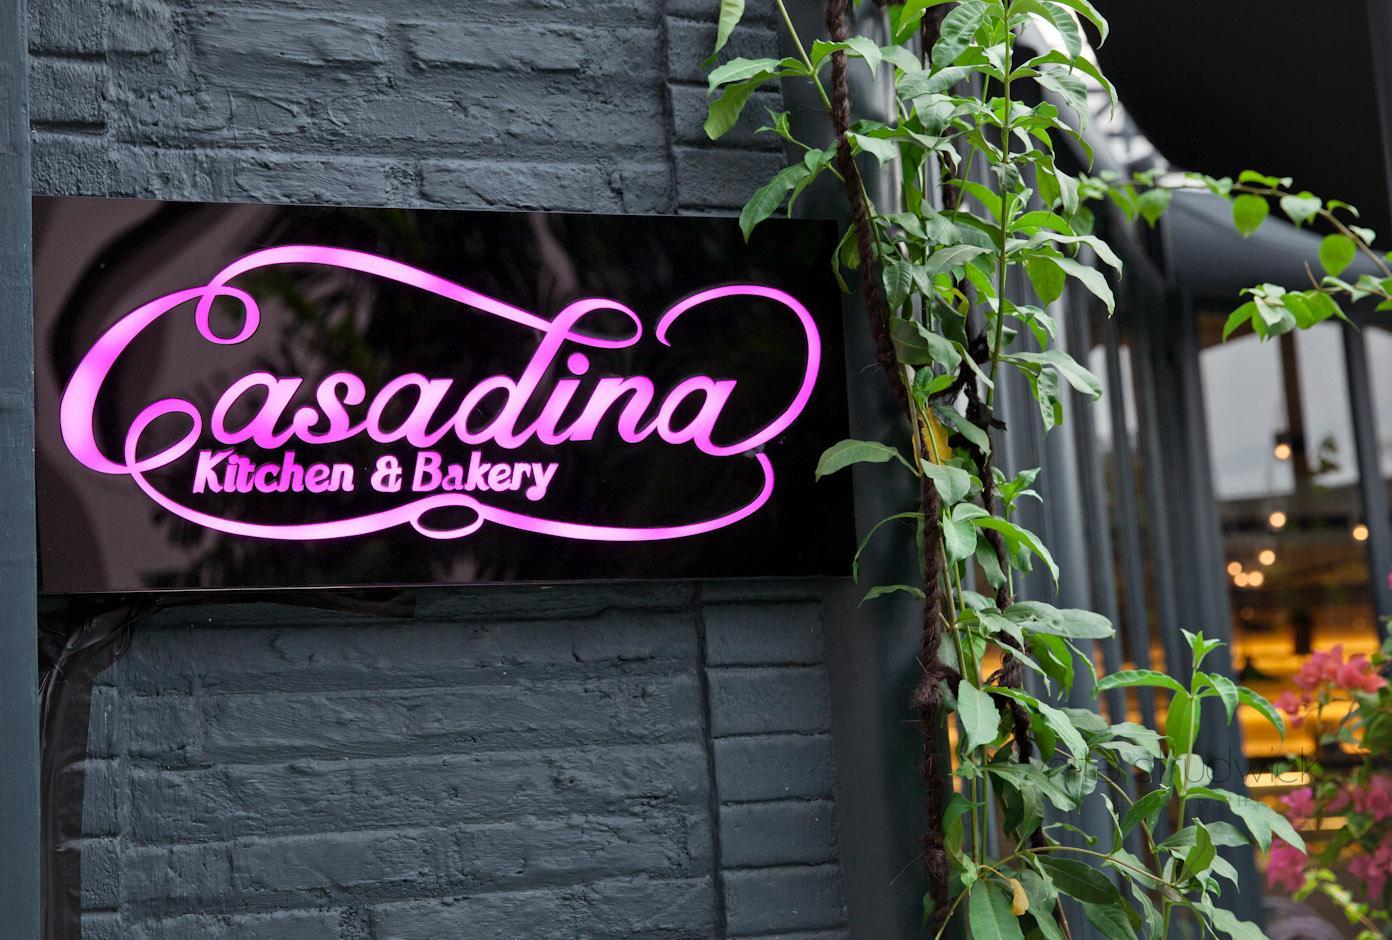 Casadina Kitchen & Bakery